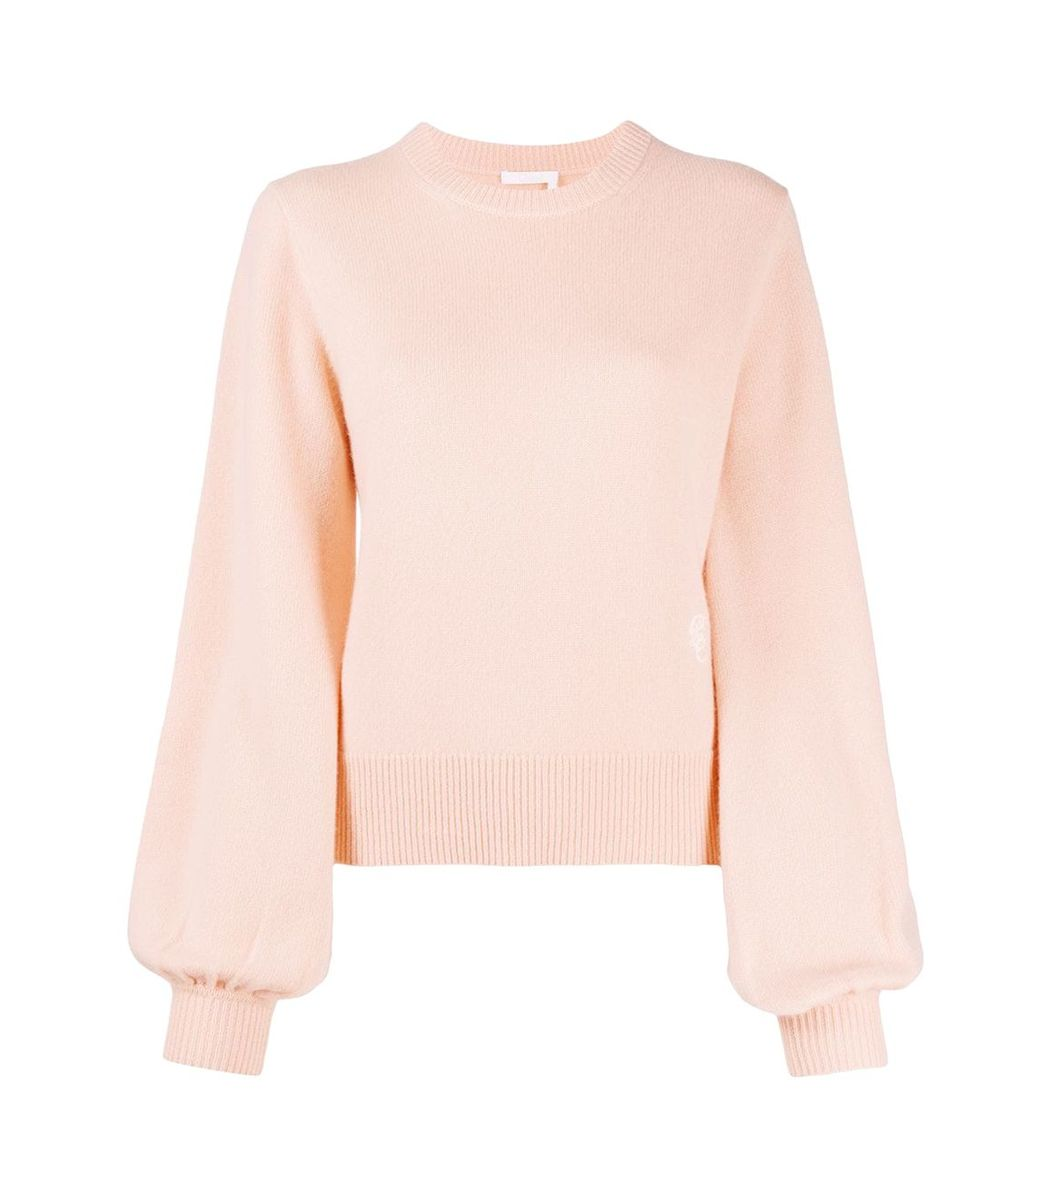 Chloé Cashmeres Light Pink Cashmere Knit Jumper